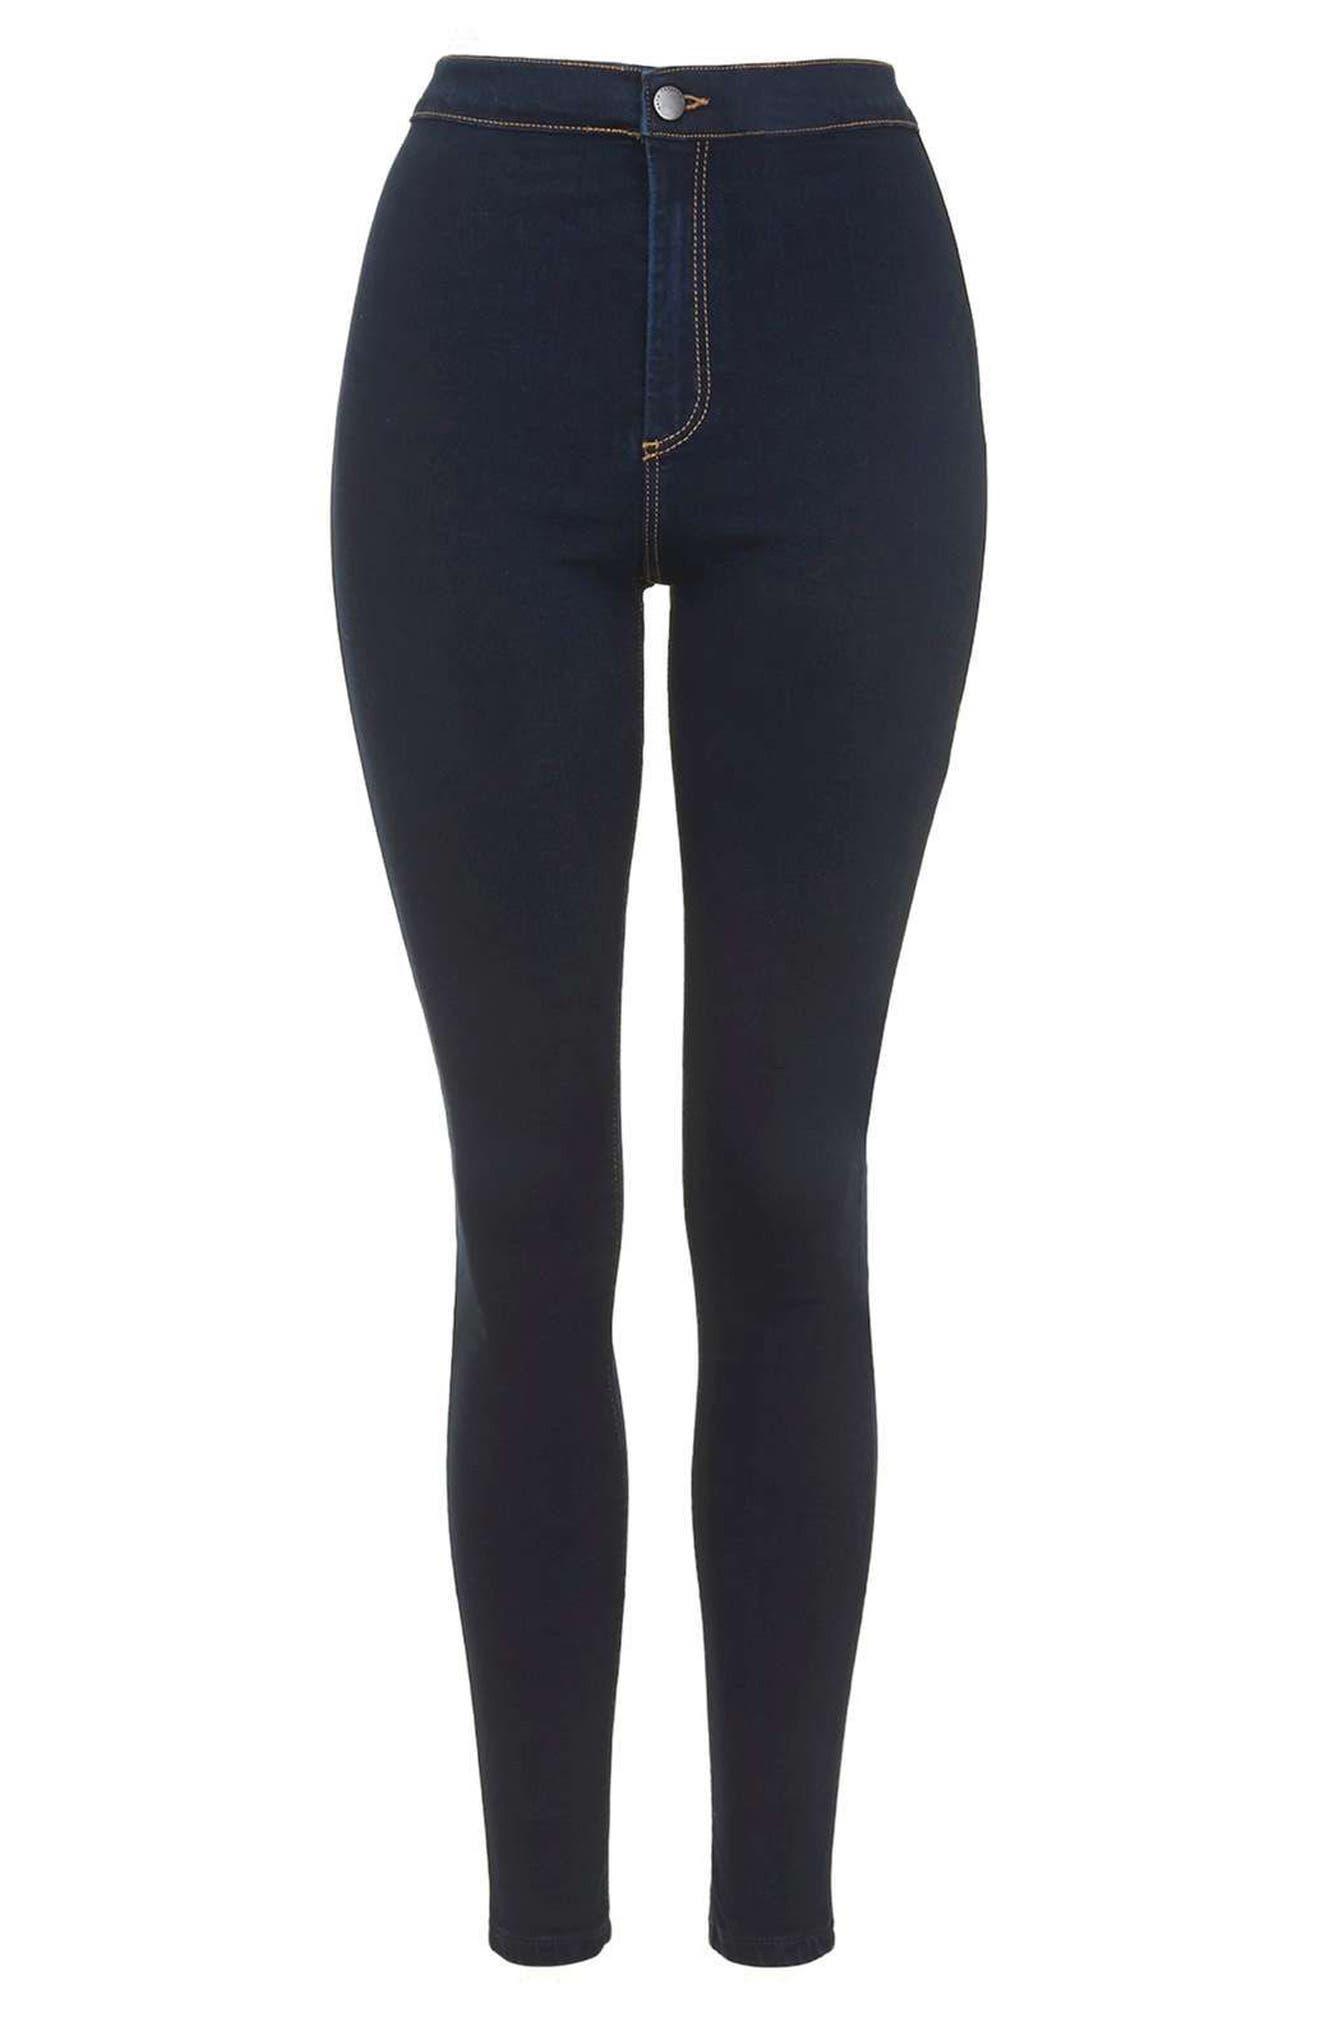 TOPSHOP,                             Joni High Waist Skinny Jeans,                             Alternate thumbnail 4, color,                             400